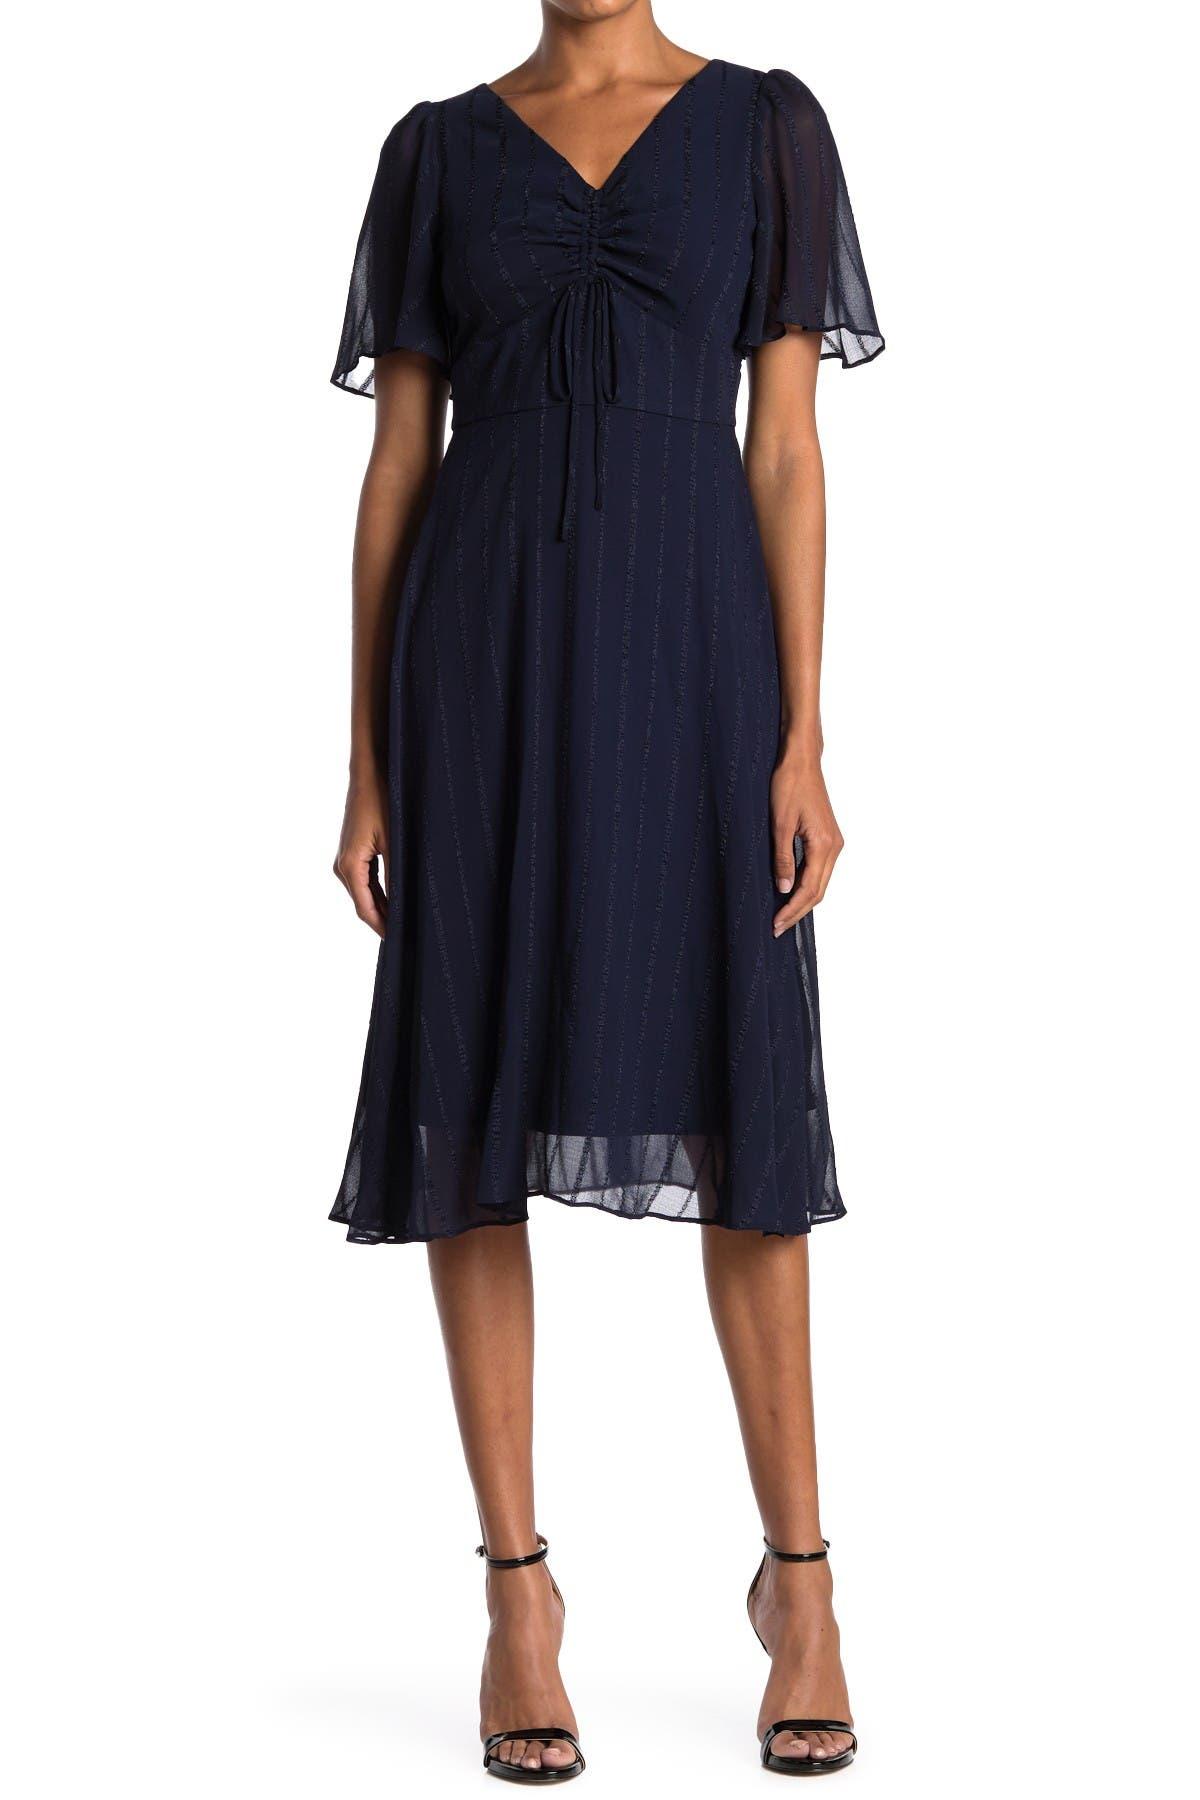 Image of Gabby Skye Striped V-Neck Flutter Sleeve Midi Dress